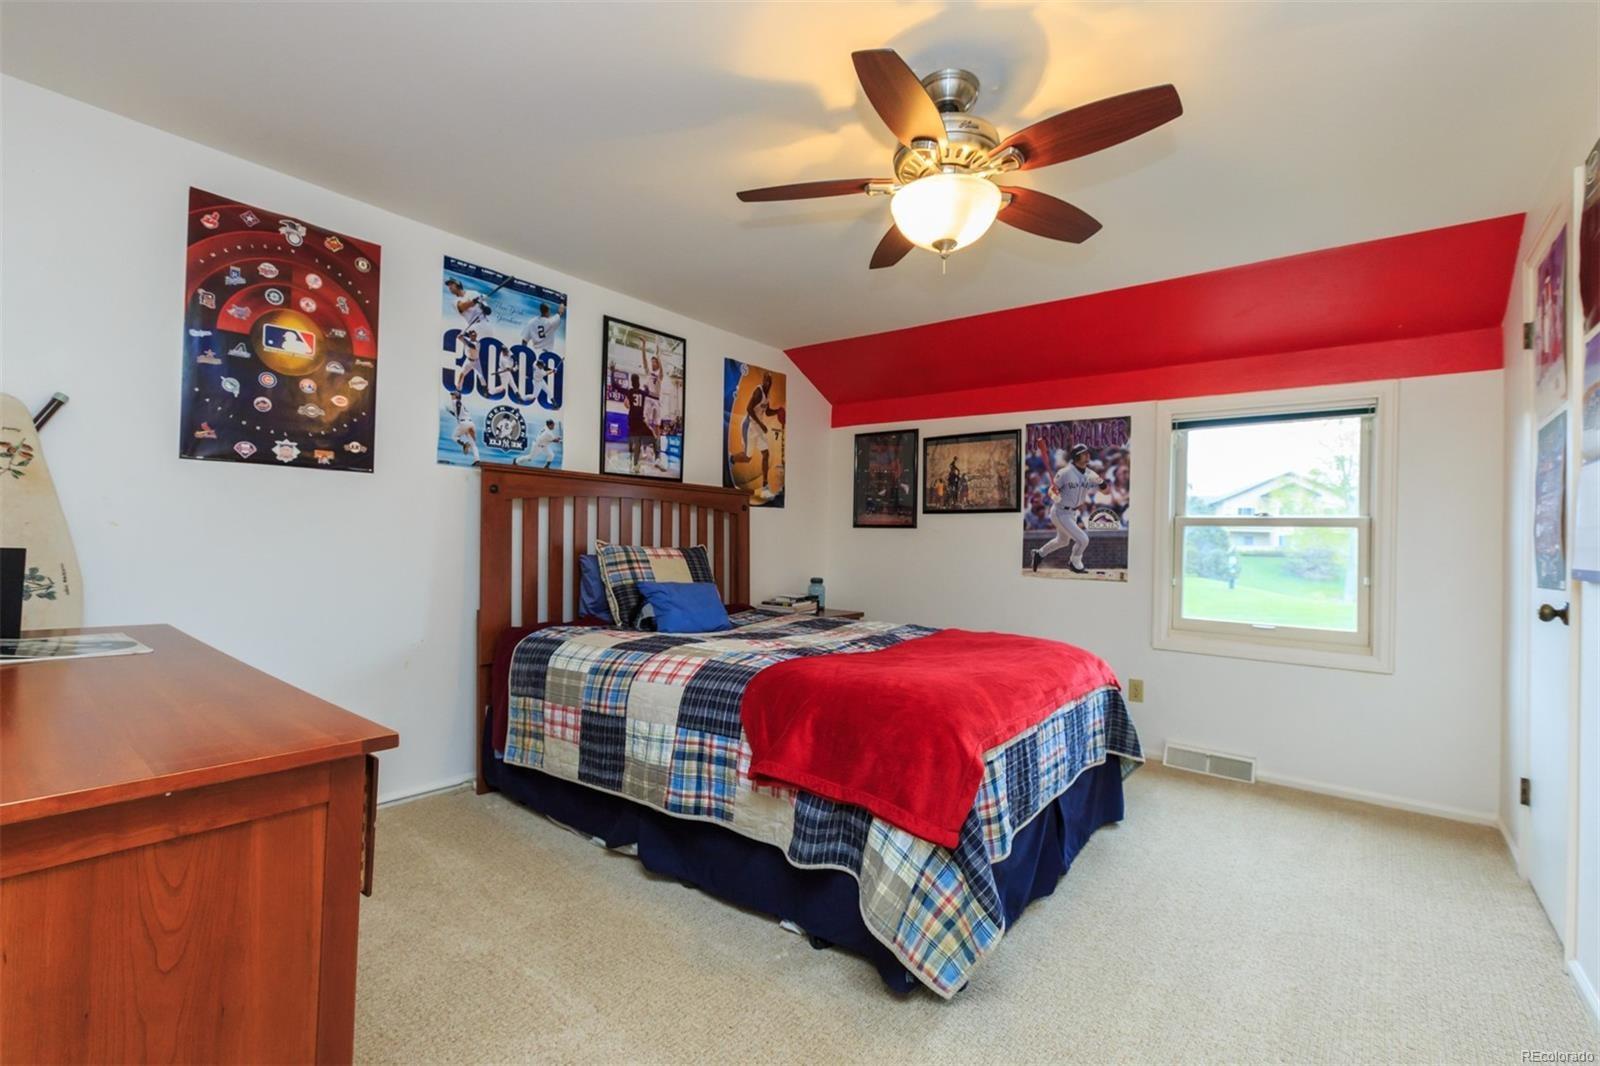 MLS# 2659668 - 1 - 8585  E Hunters Hill Drive, Centennial, CO 80112